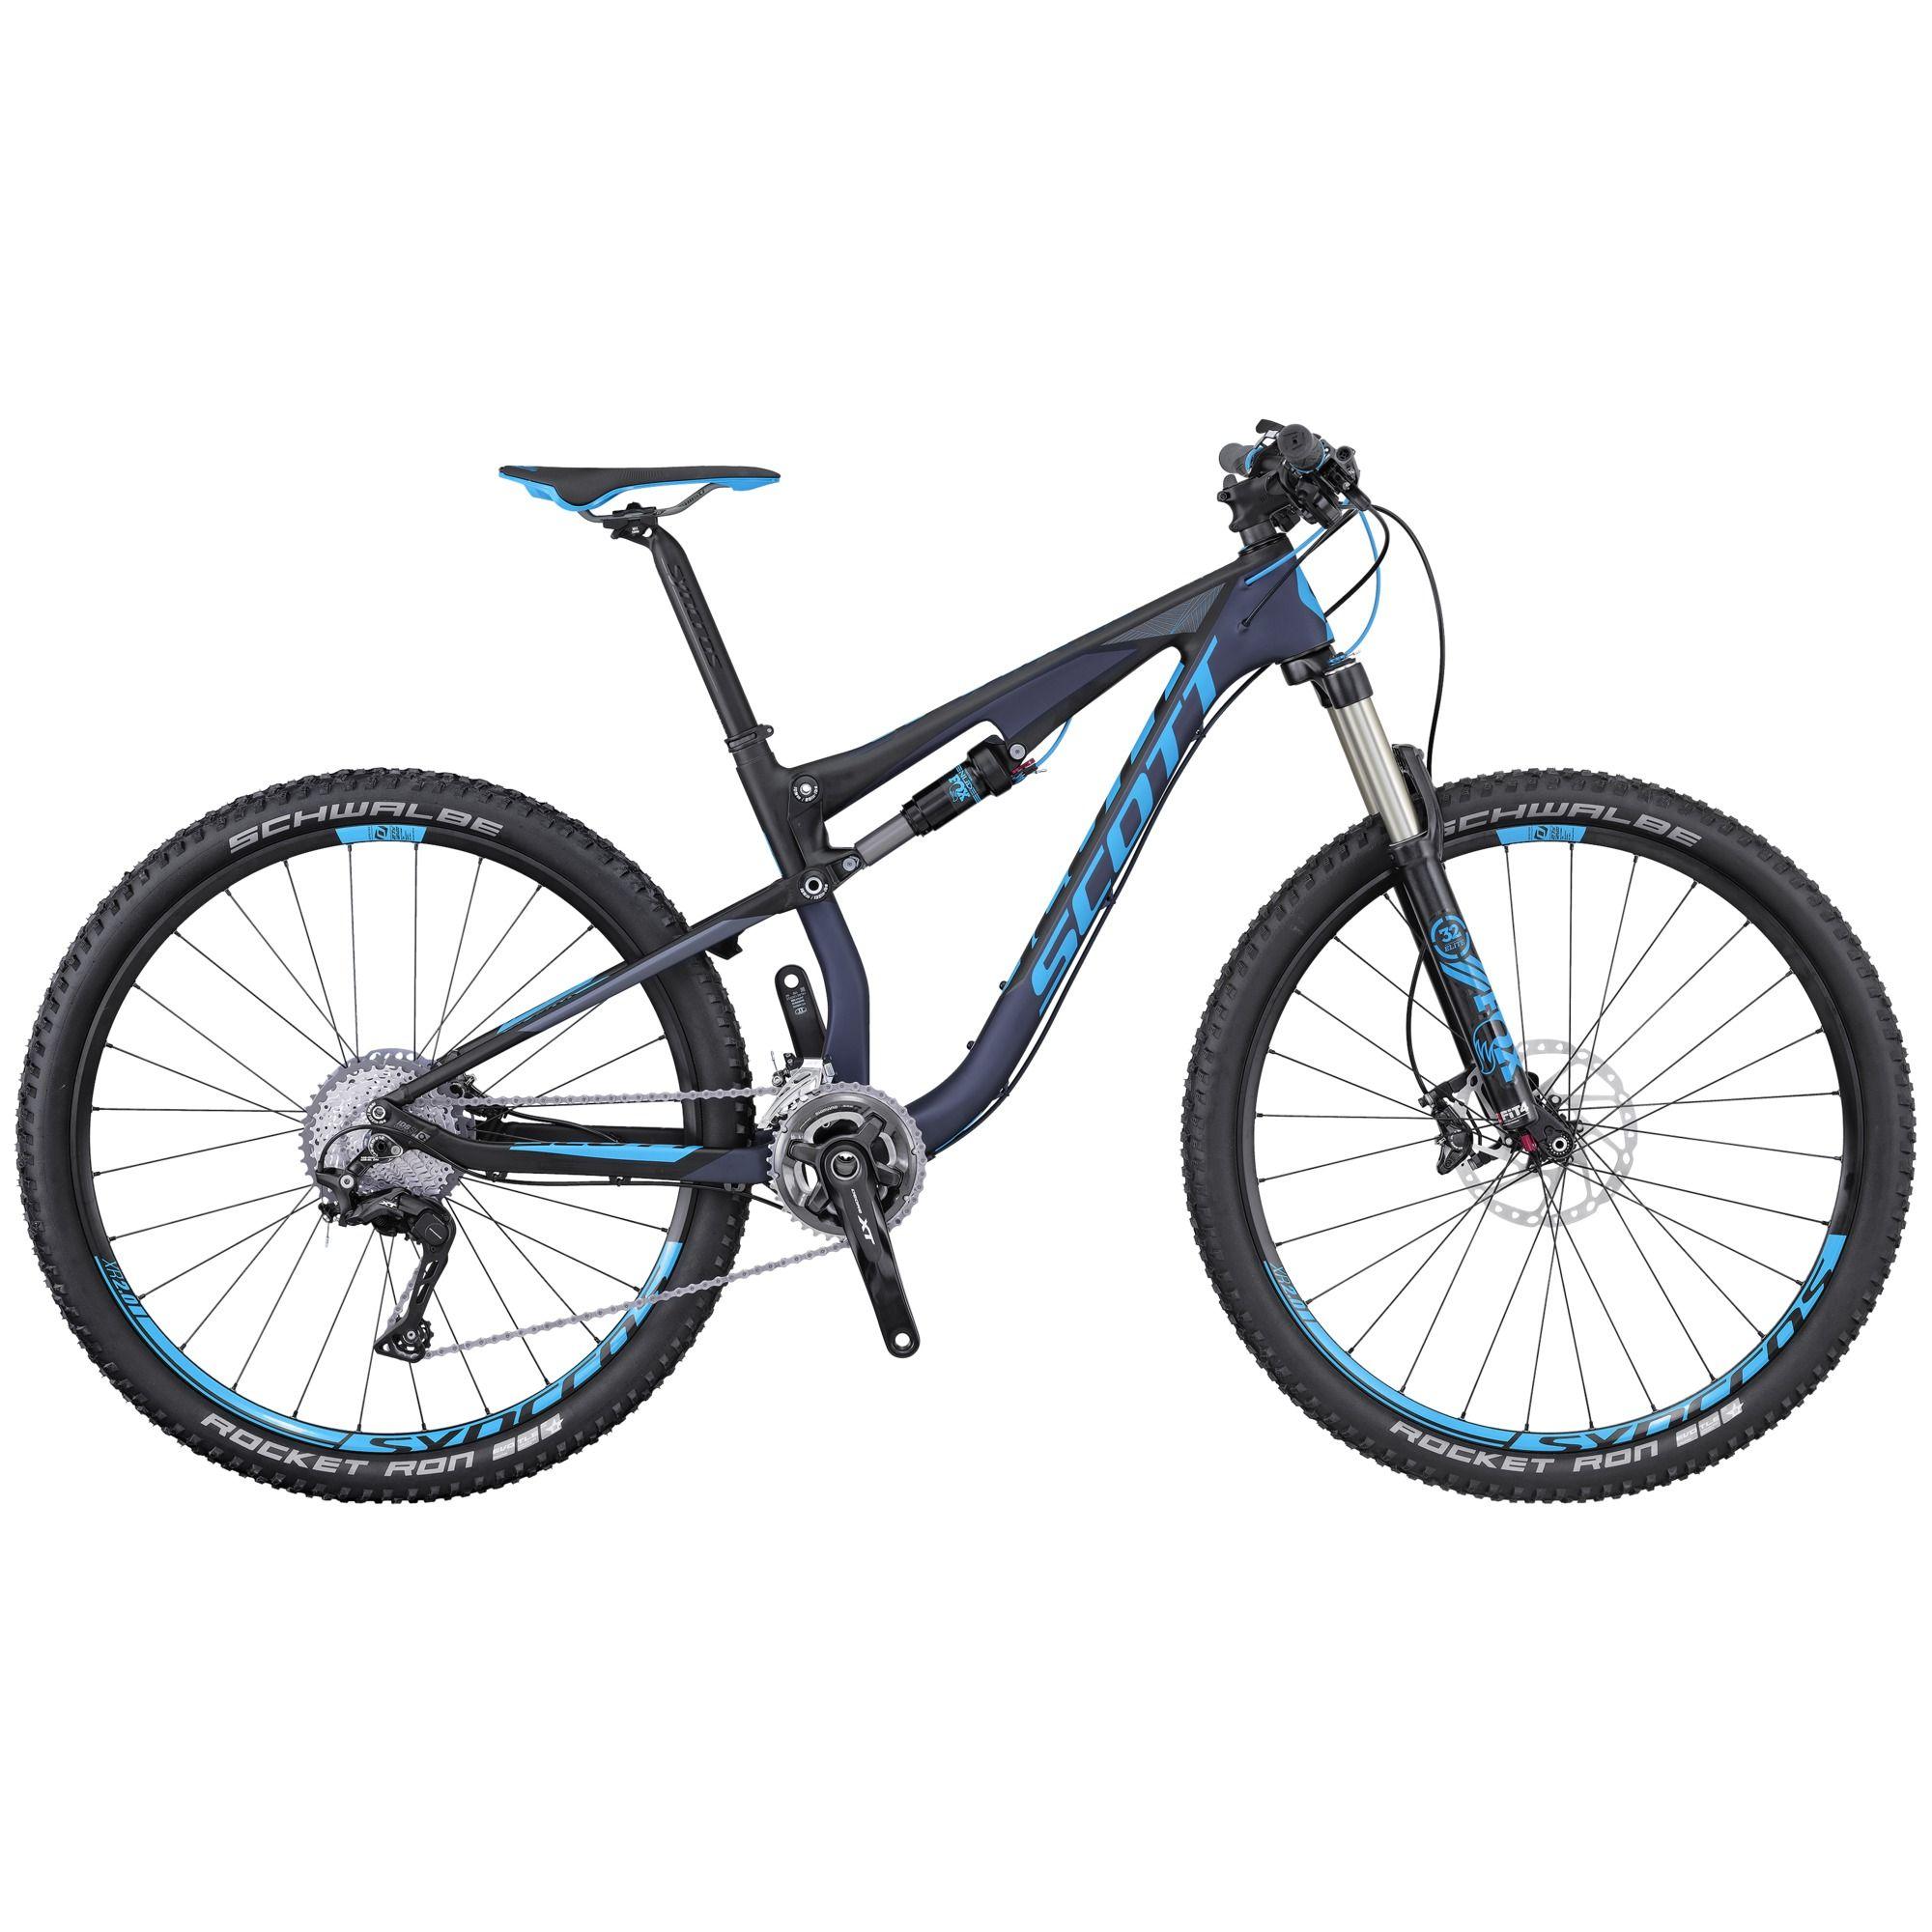 2016 Scott Contessa Spark 700 Rc Carbon Womens Mountain Bike Grey